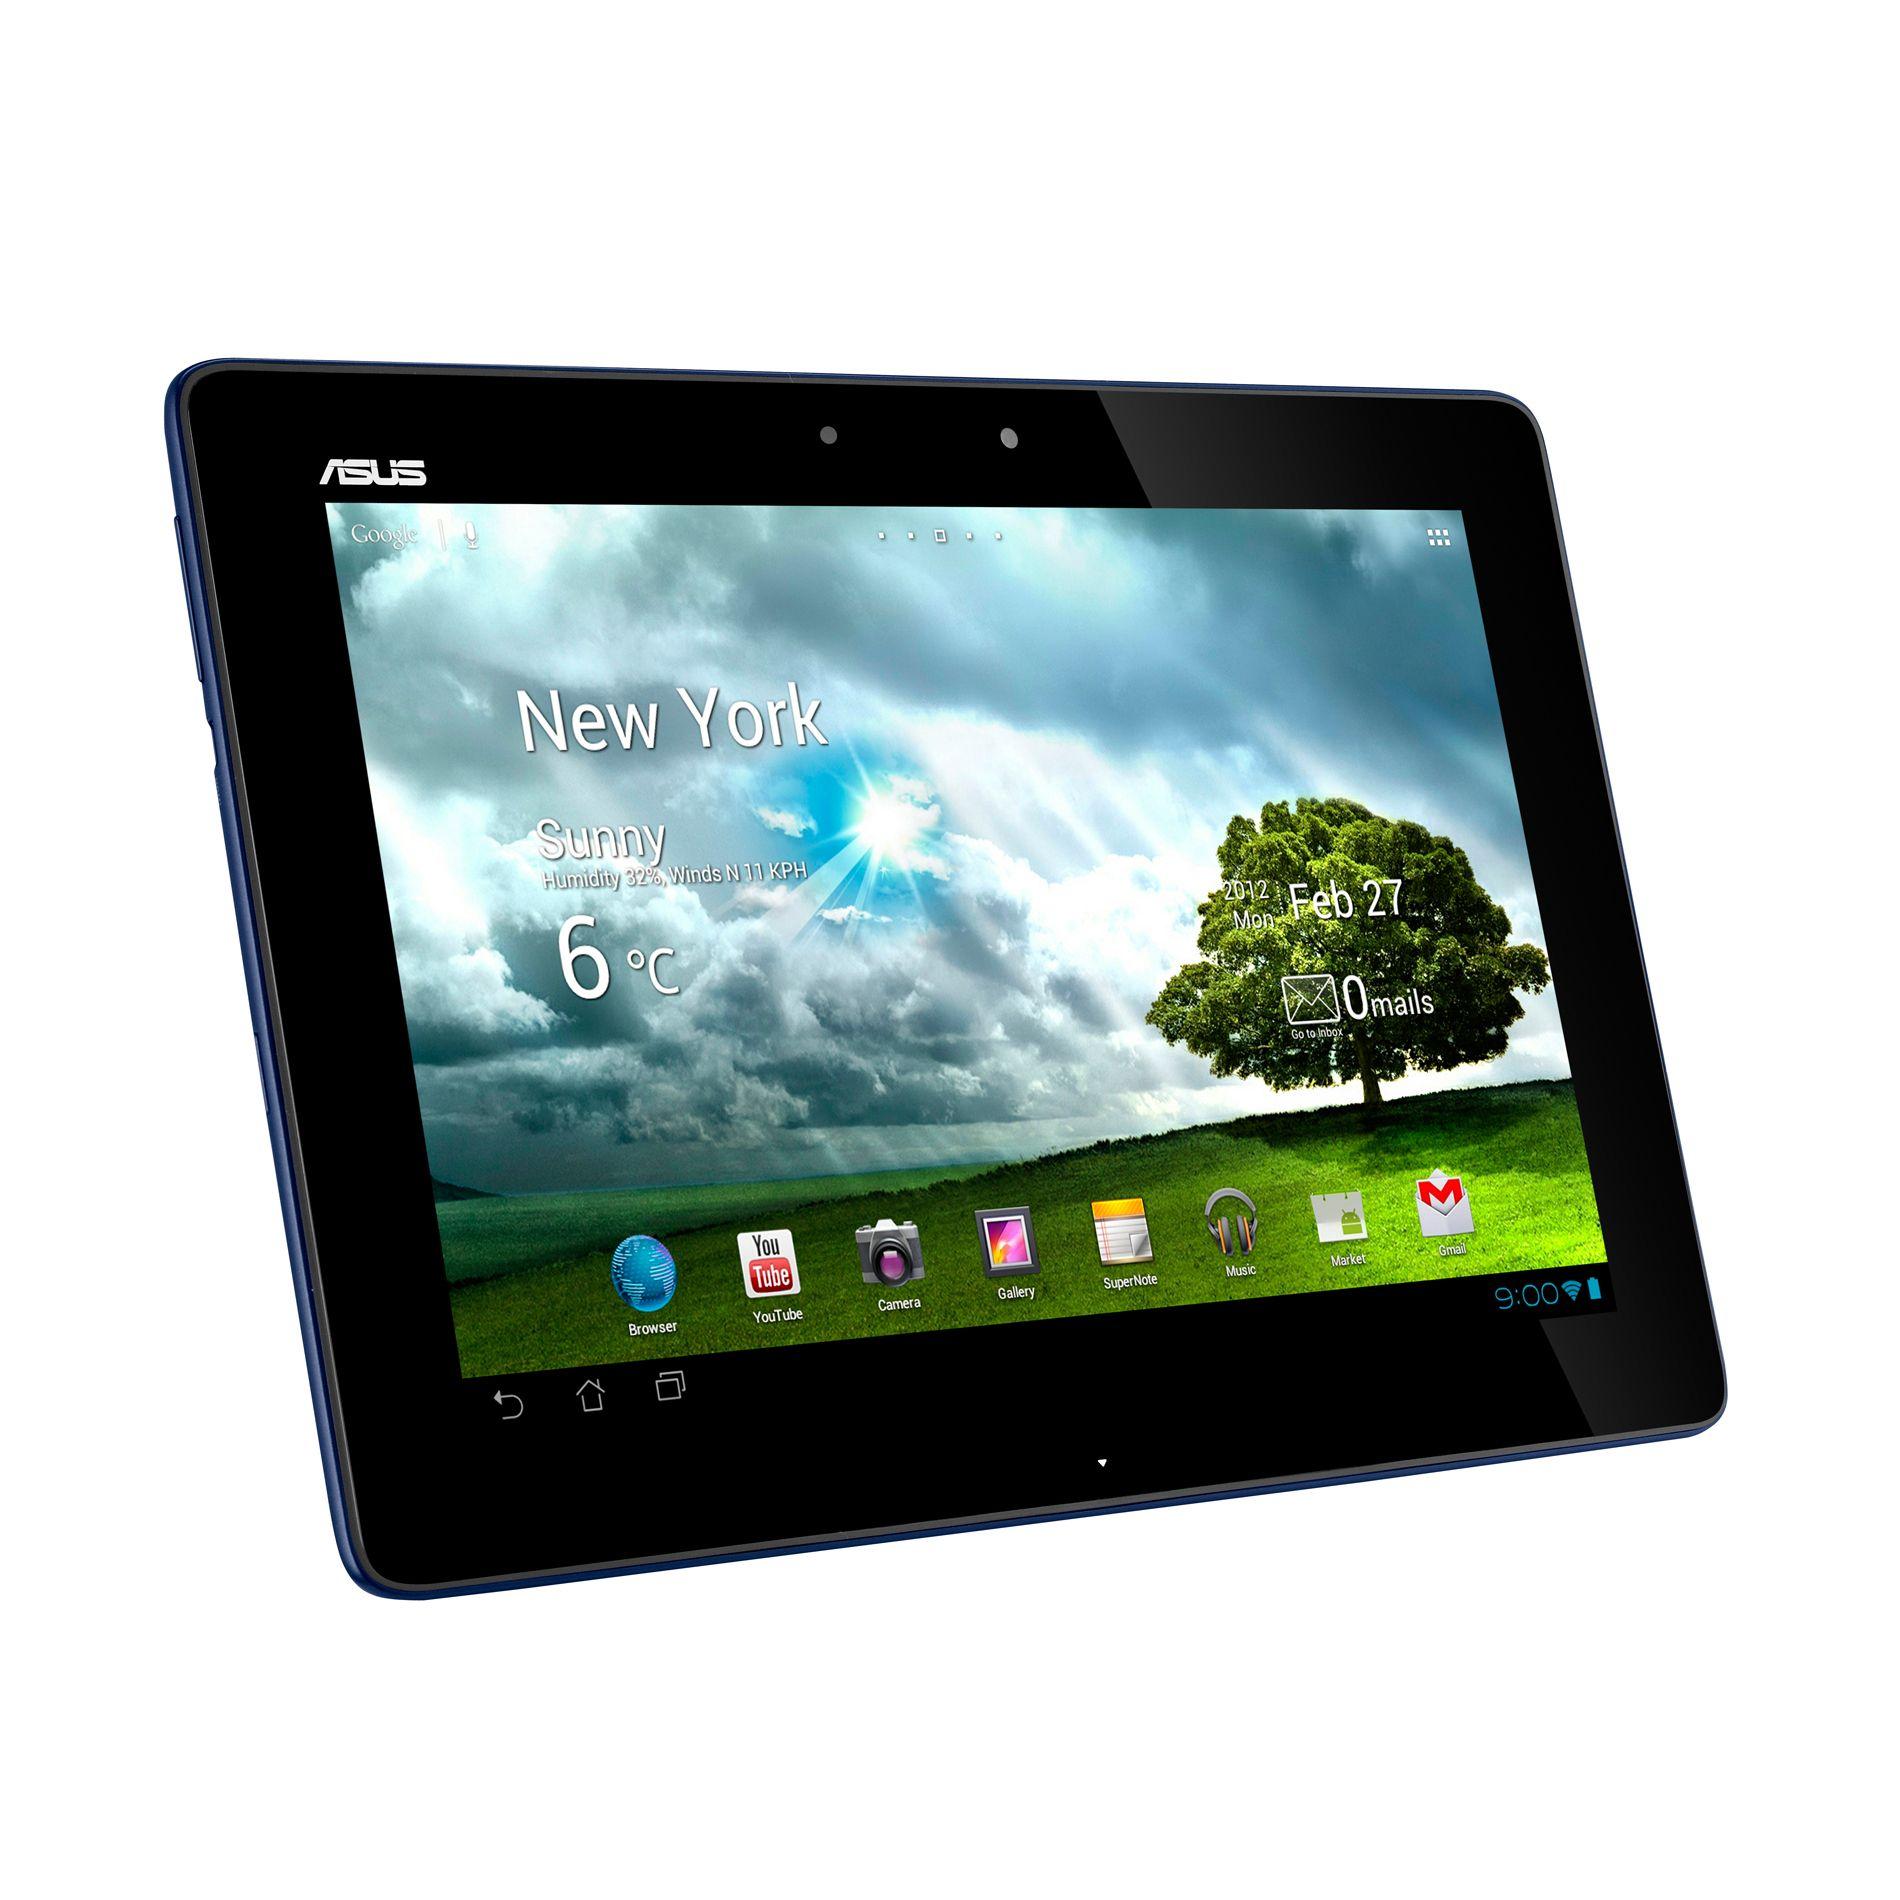 Asus Transformer Pad Tablet TF300T-B1-BL